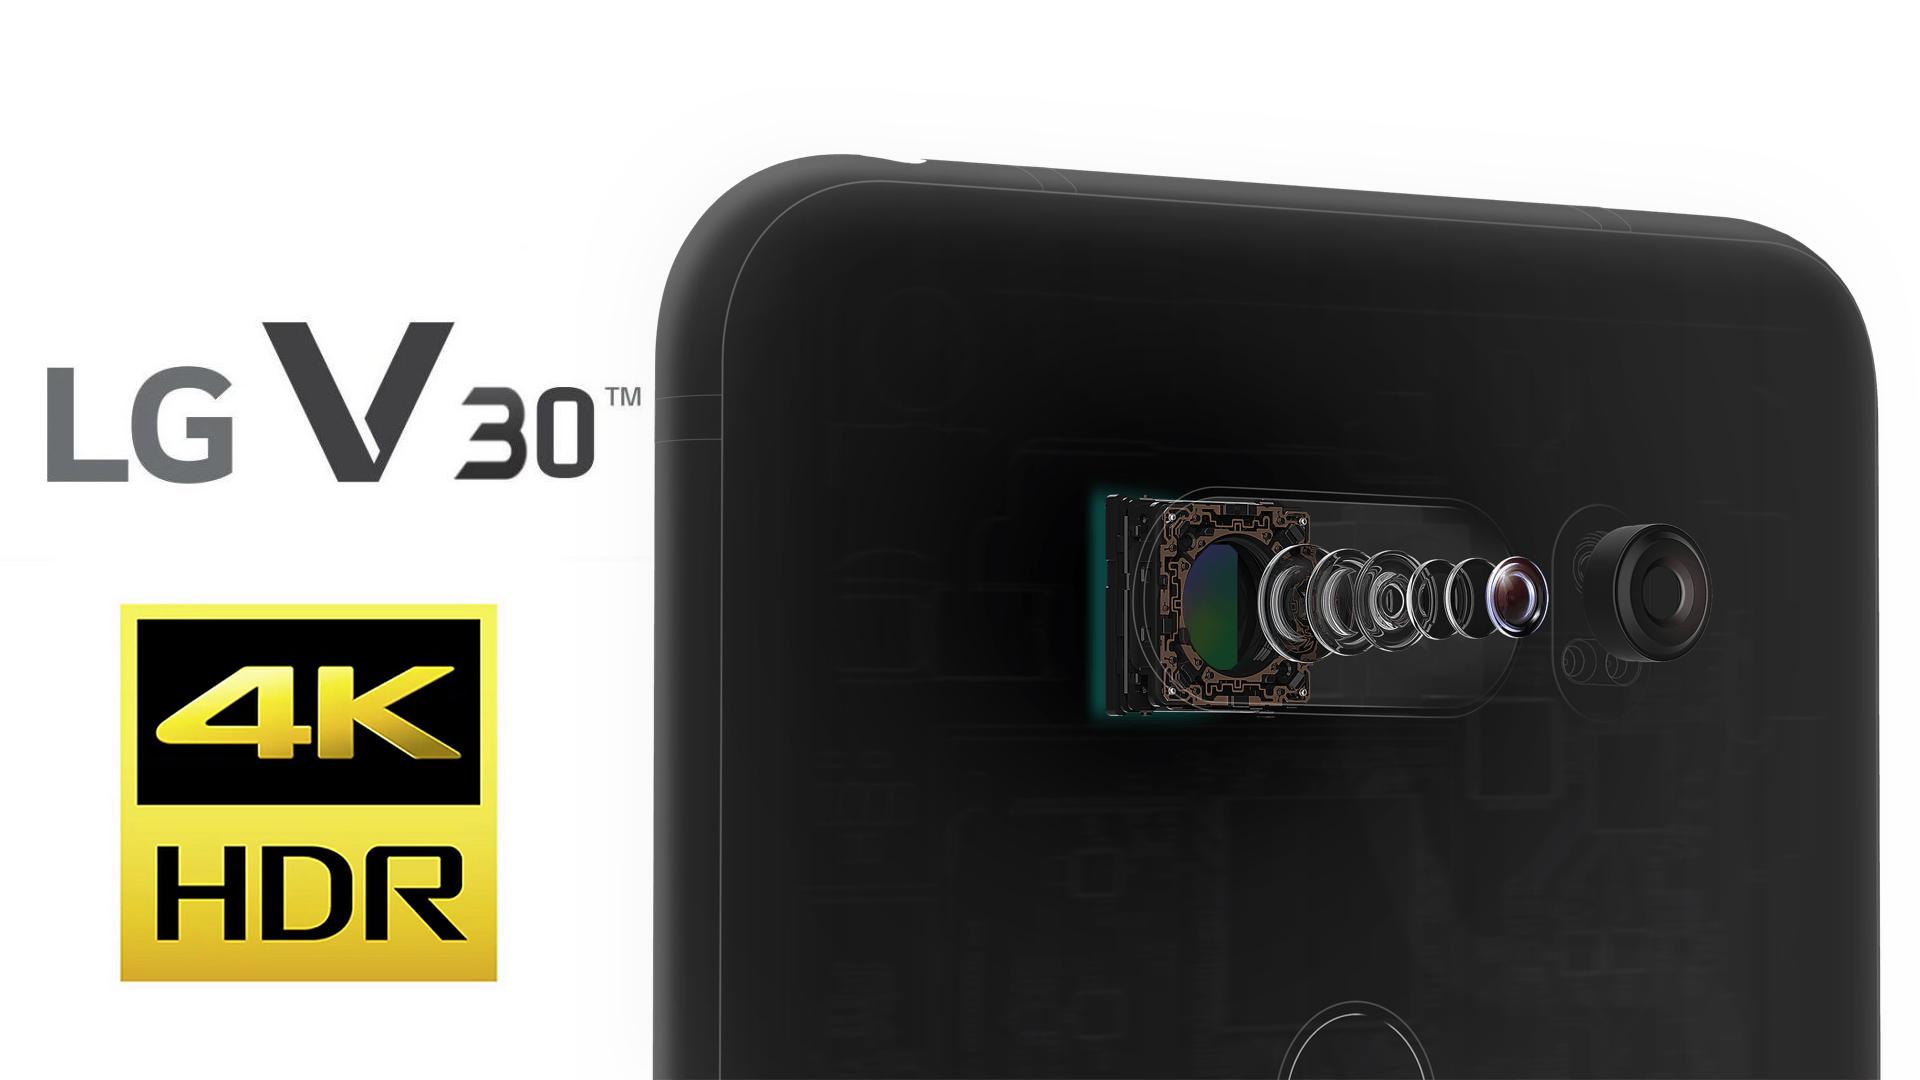 LGのV30スマートフォン -10bitカラー、LG Cine-Logを搭載?